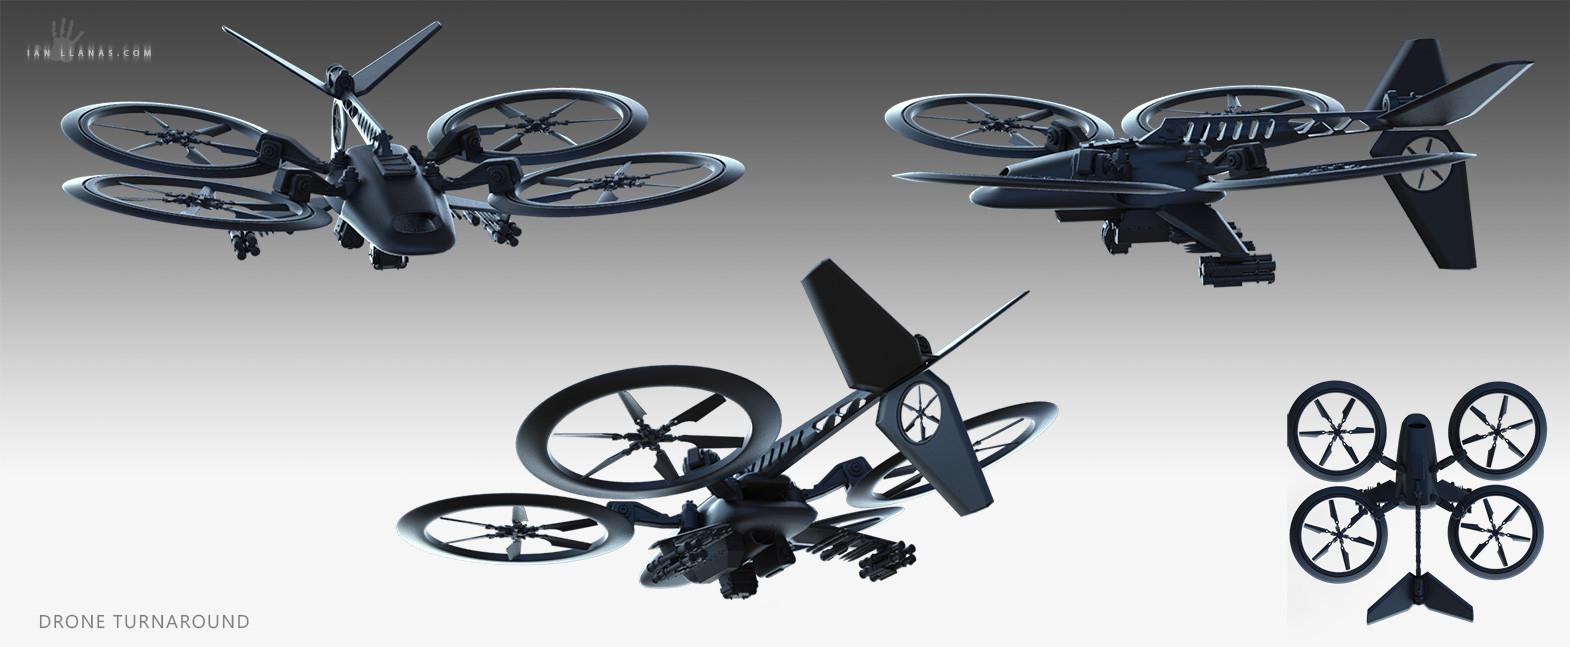 Ian llanas droneturnaroundfinal